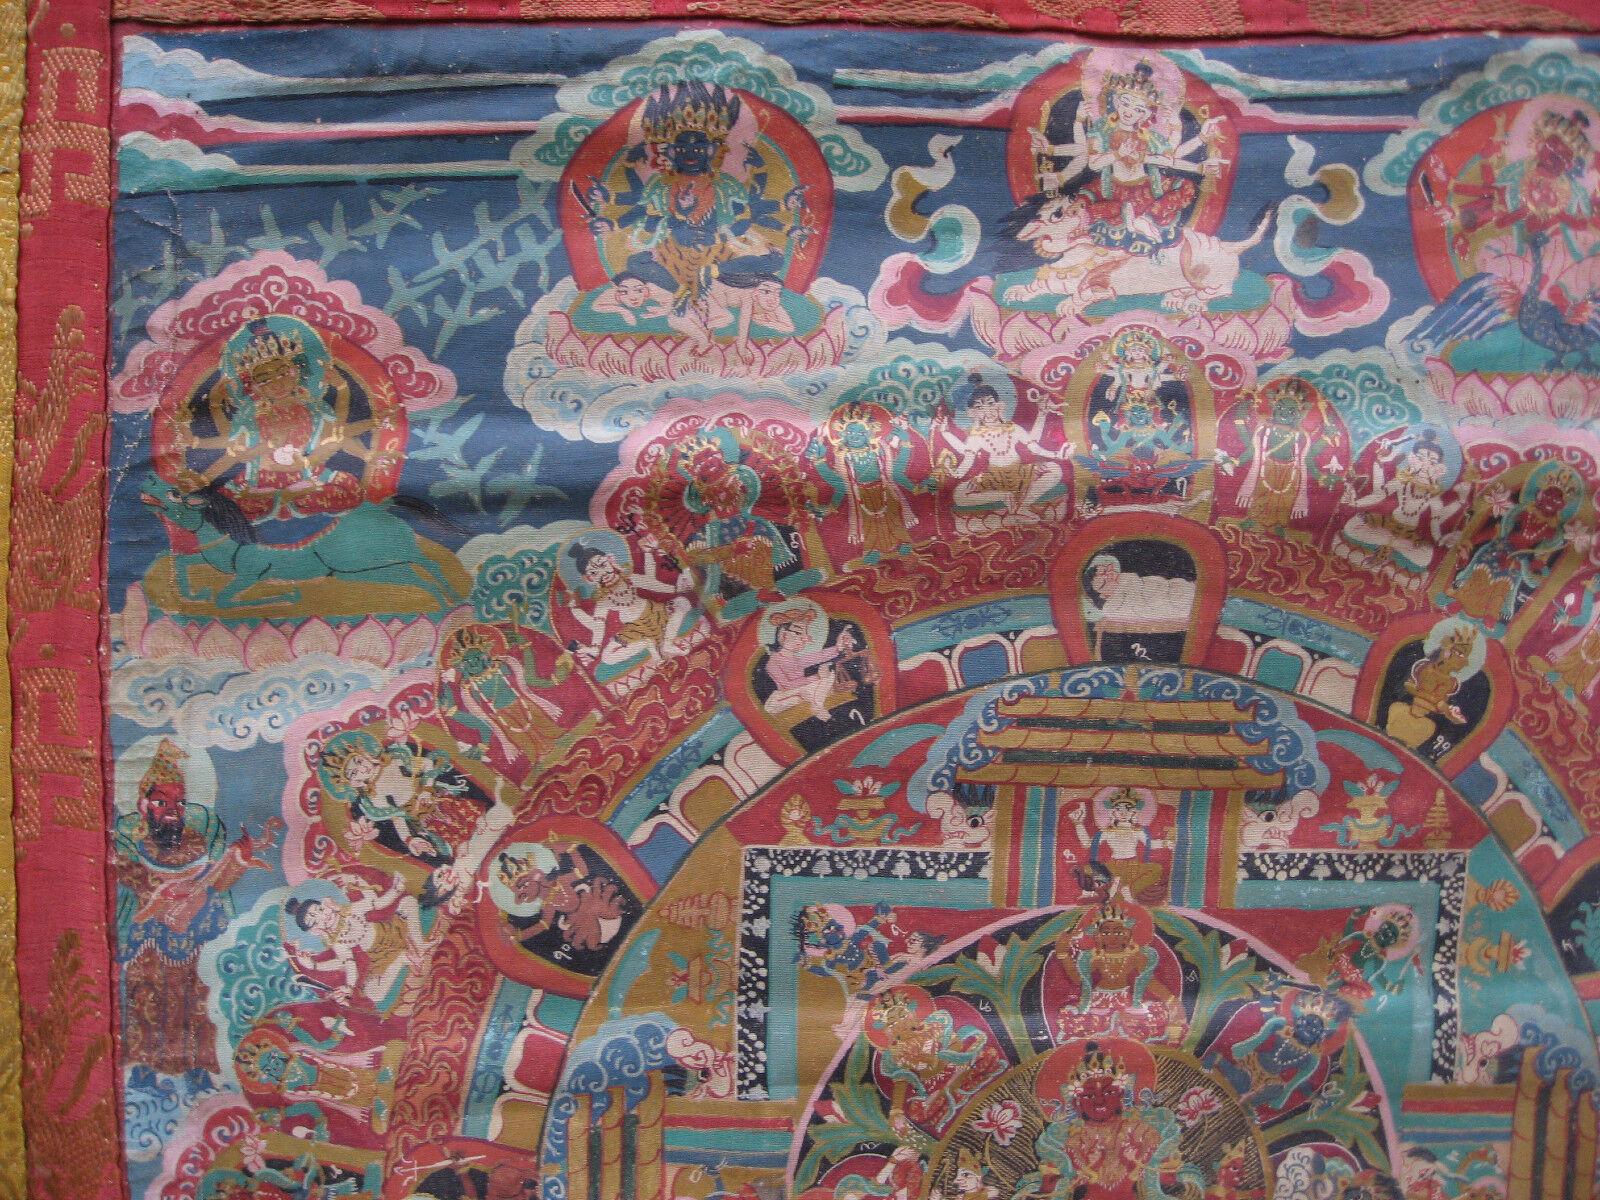 Antico More Then 100 Anni di Età Età Età Newari Surya Mandala Thangka Pauwa , Nepal ecedd8